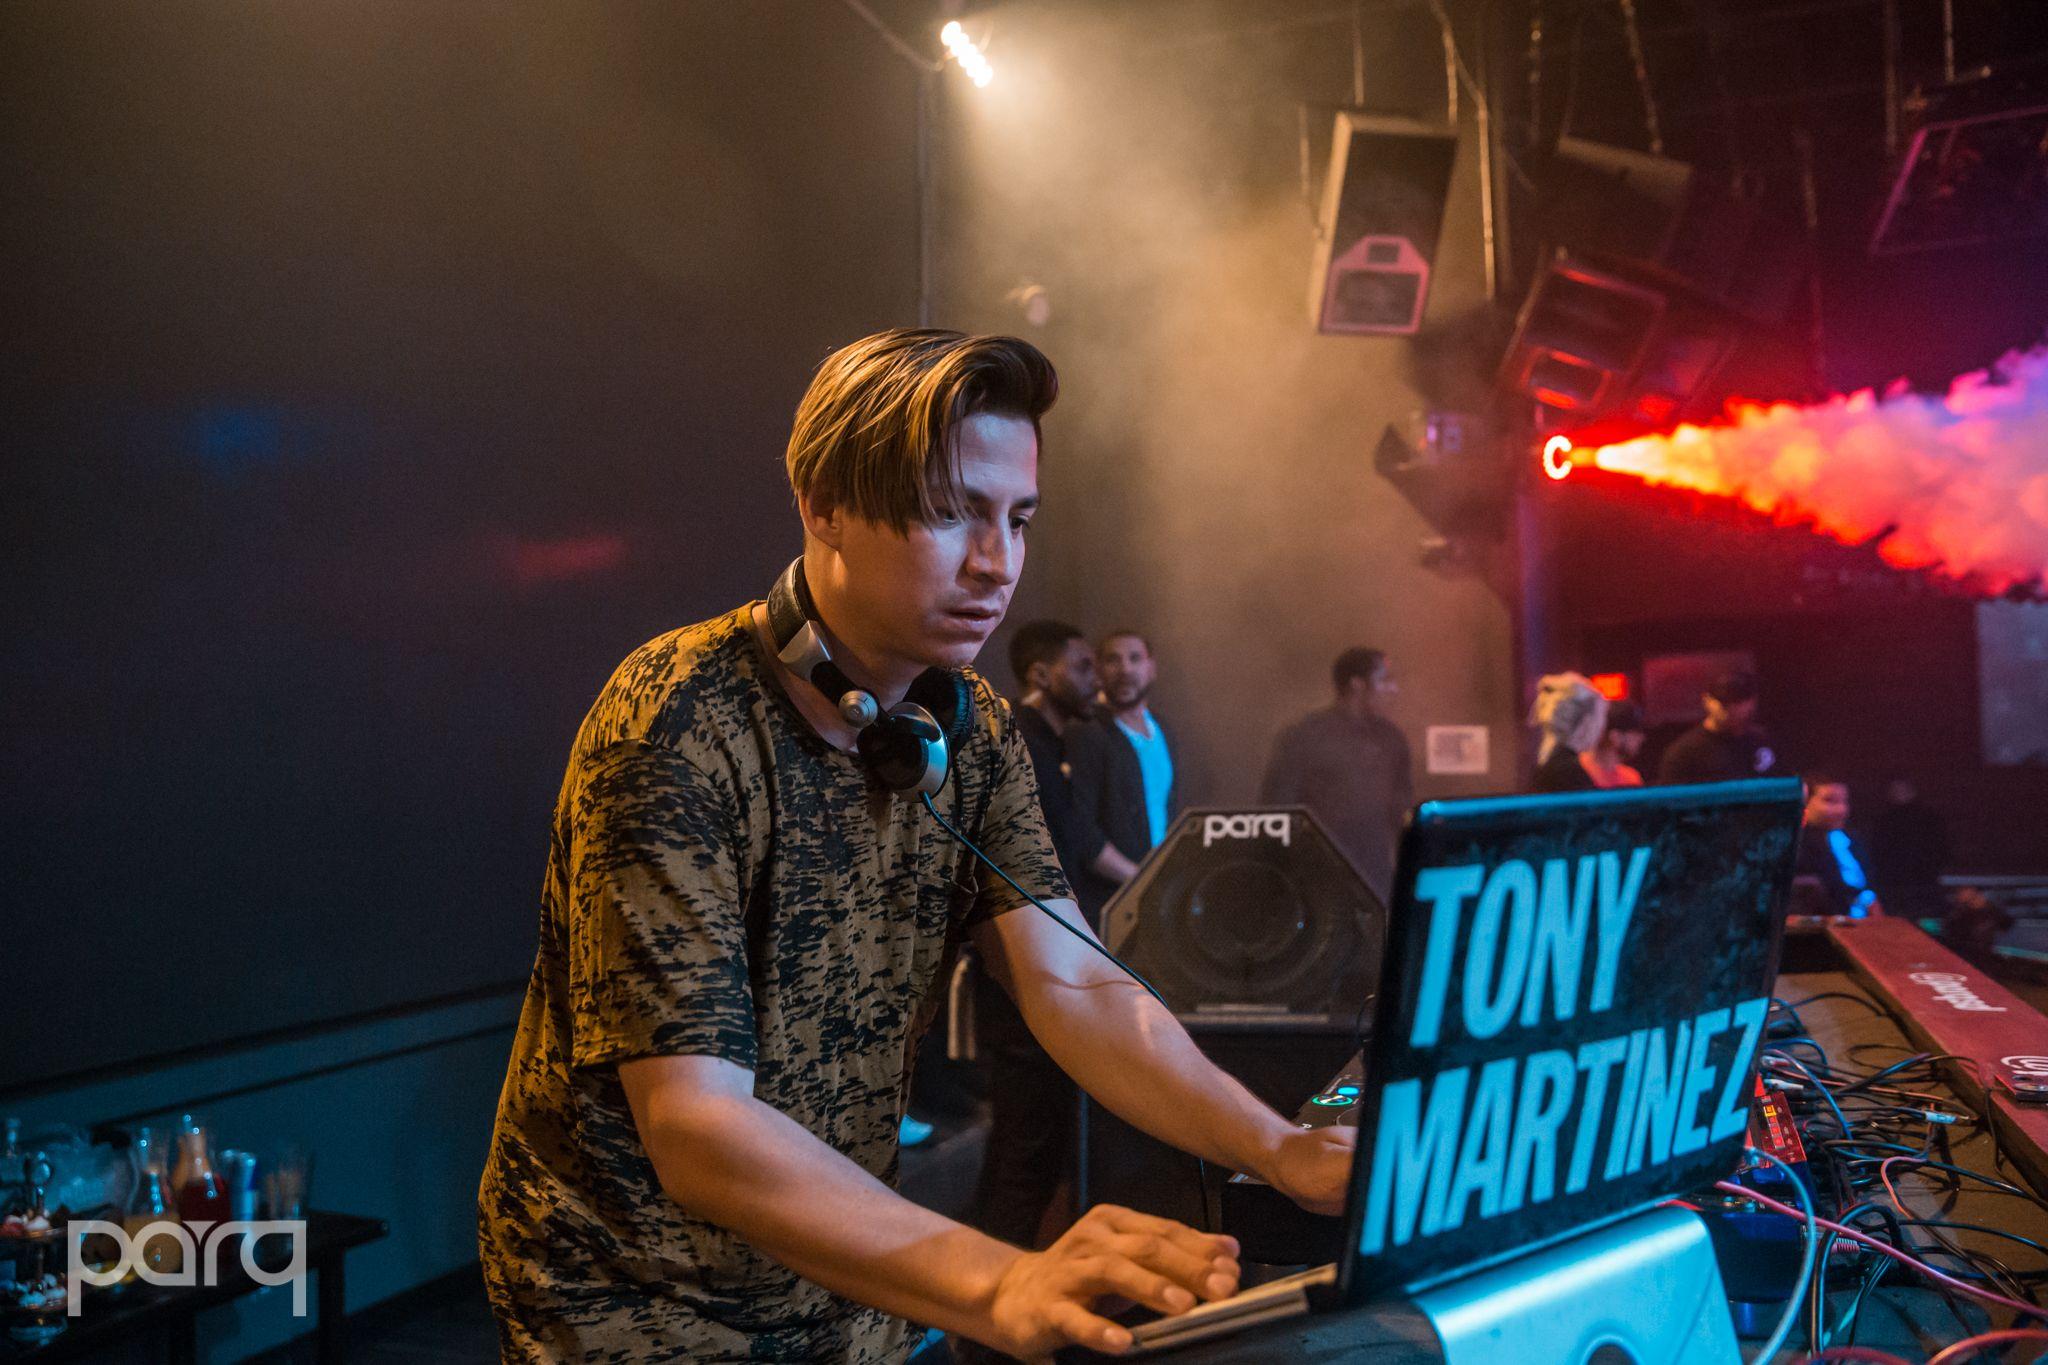 09.14.18 Parq - Tony Martinez-4.jpg